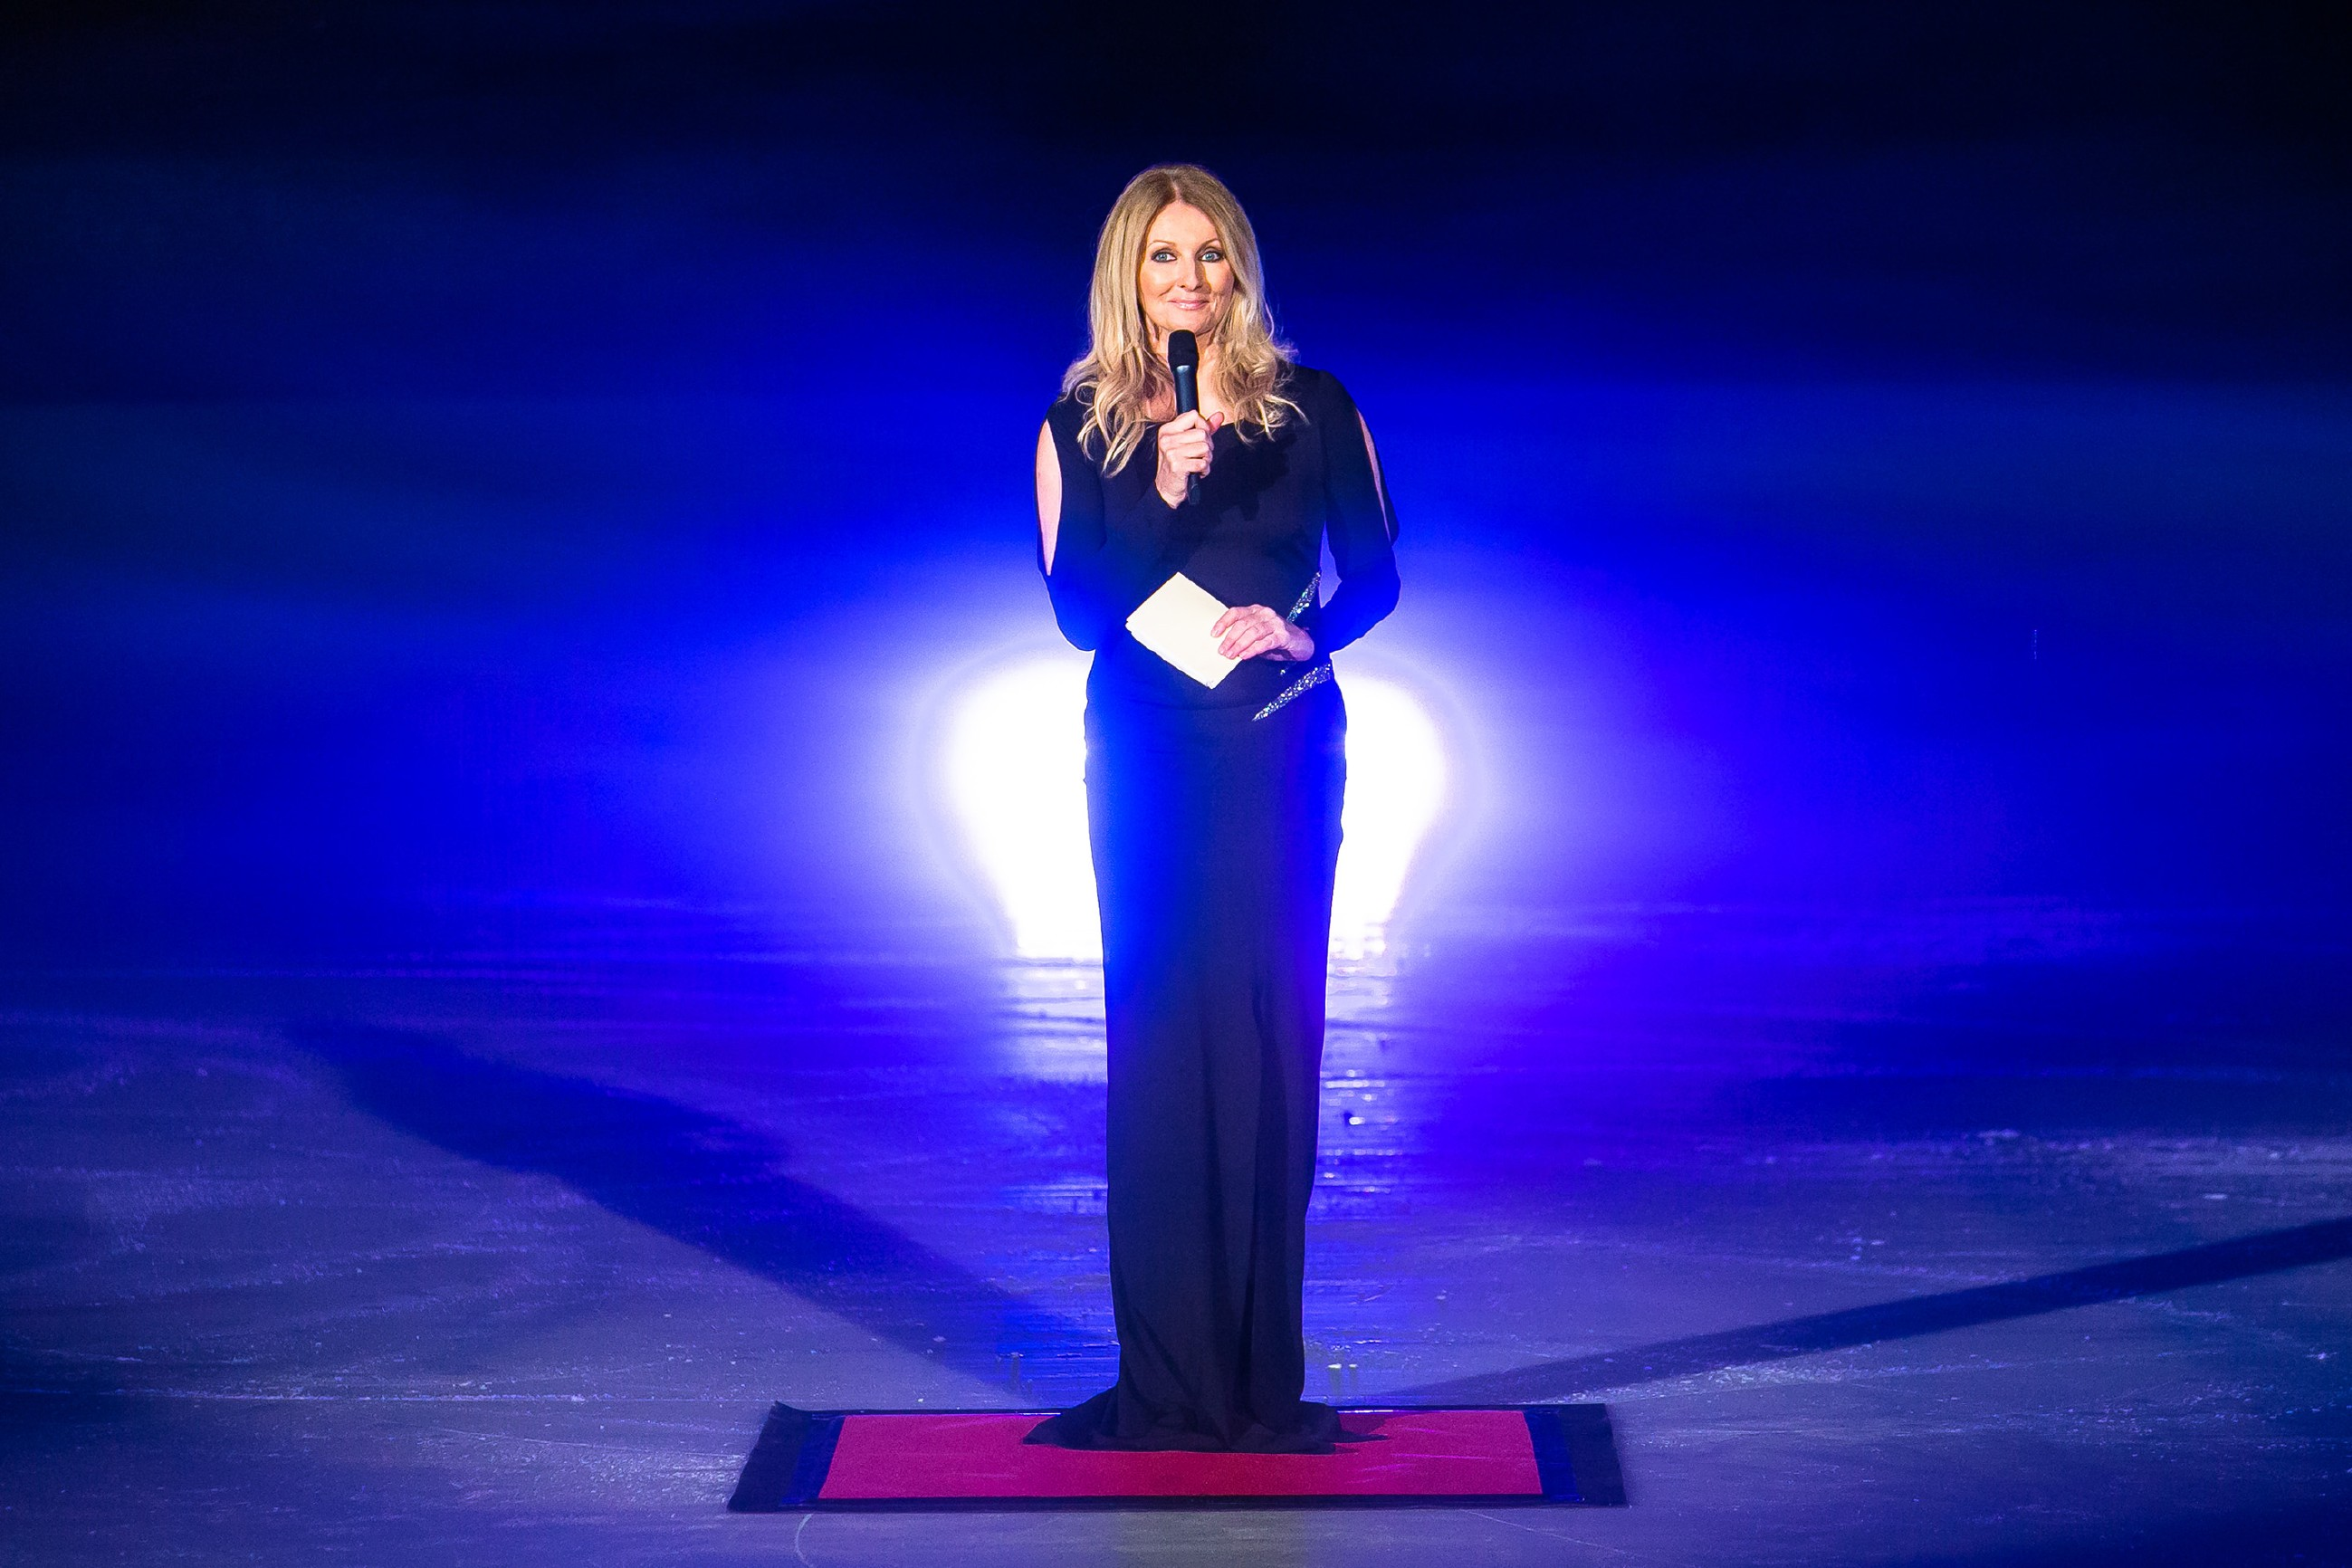 Promi-Gast Frauke Ludowig kündigt Dianas Kür an.